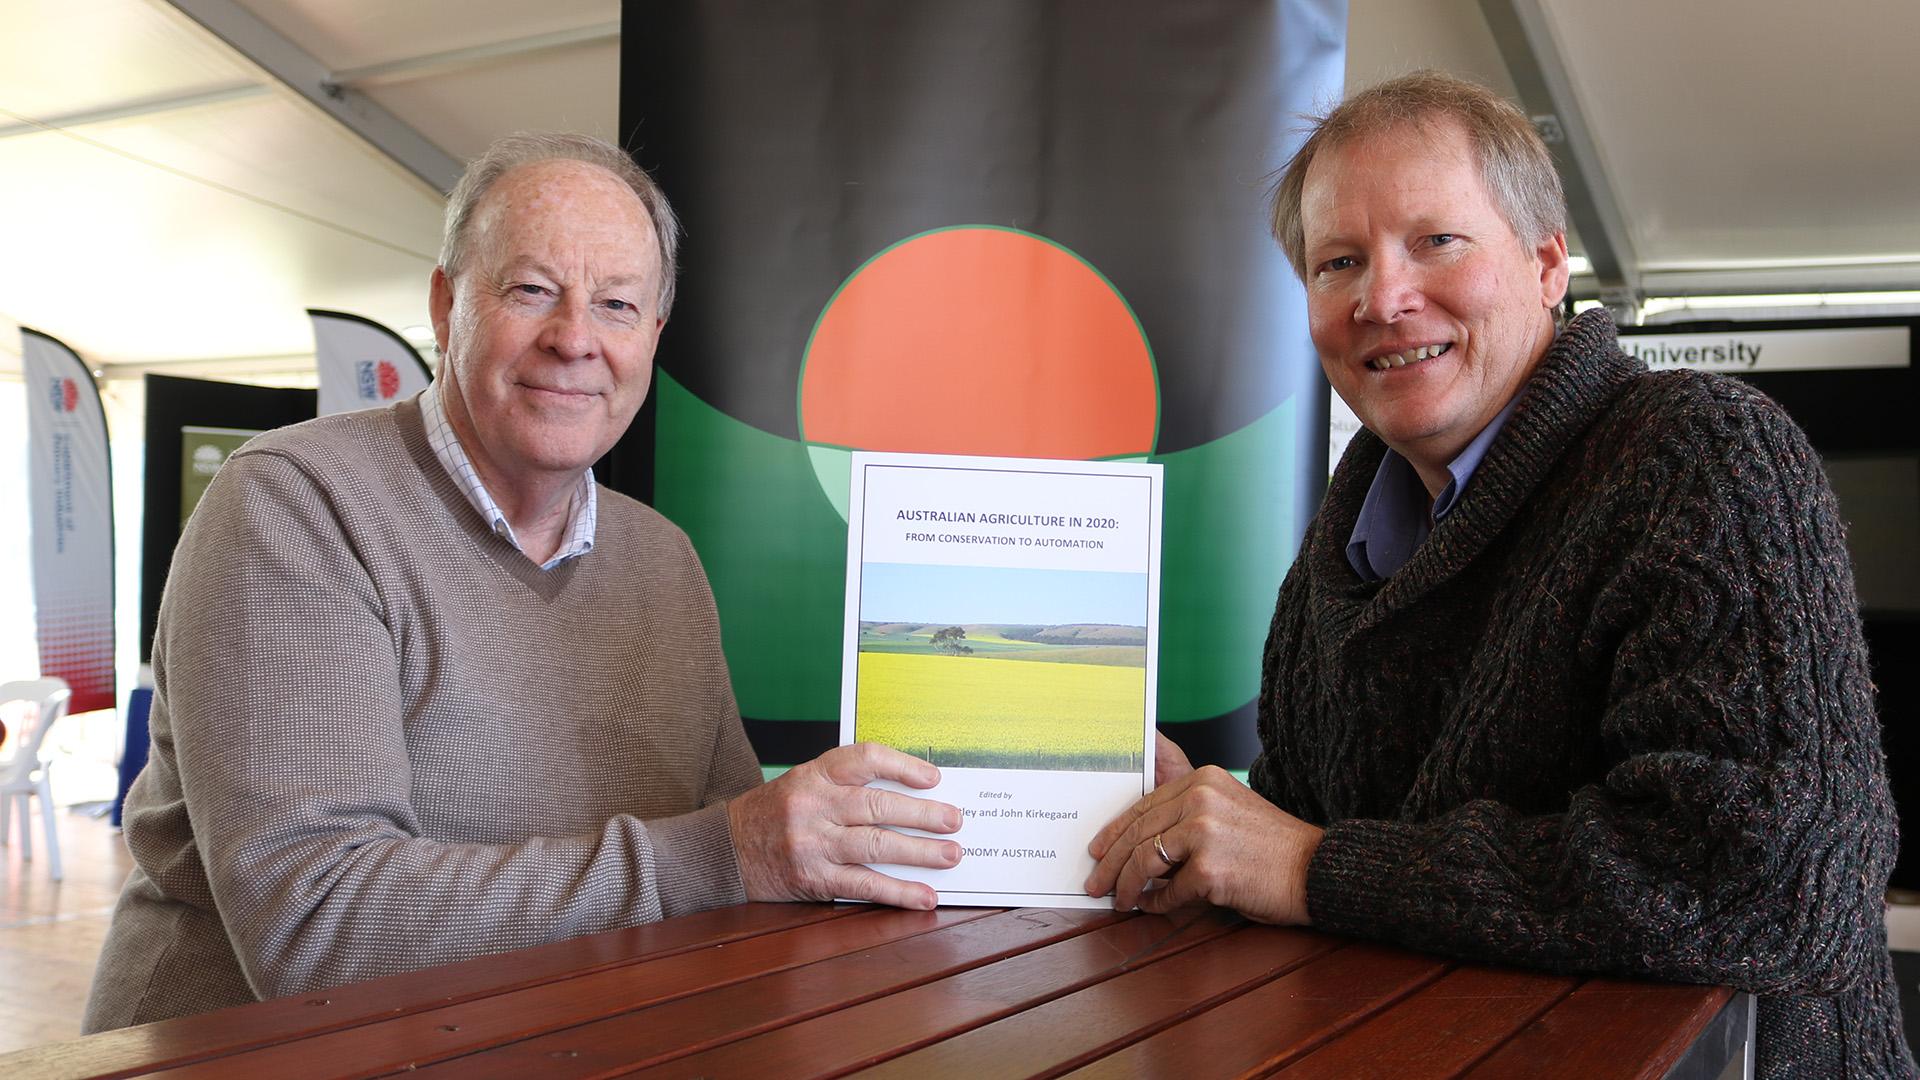 Professor Jim Pratley and Dr John Kirkegaard